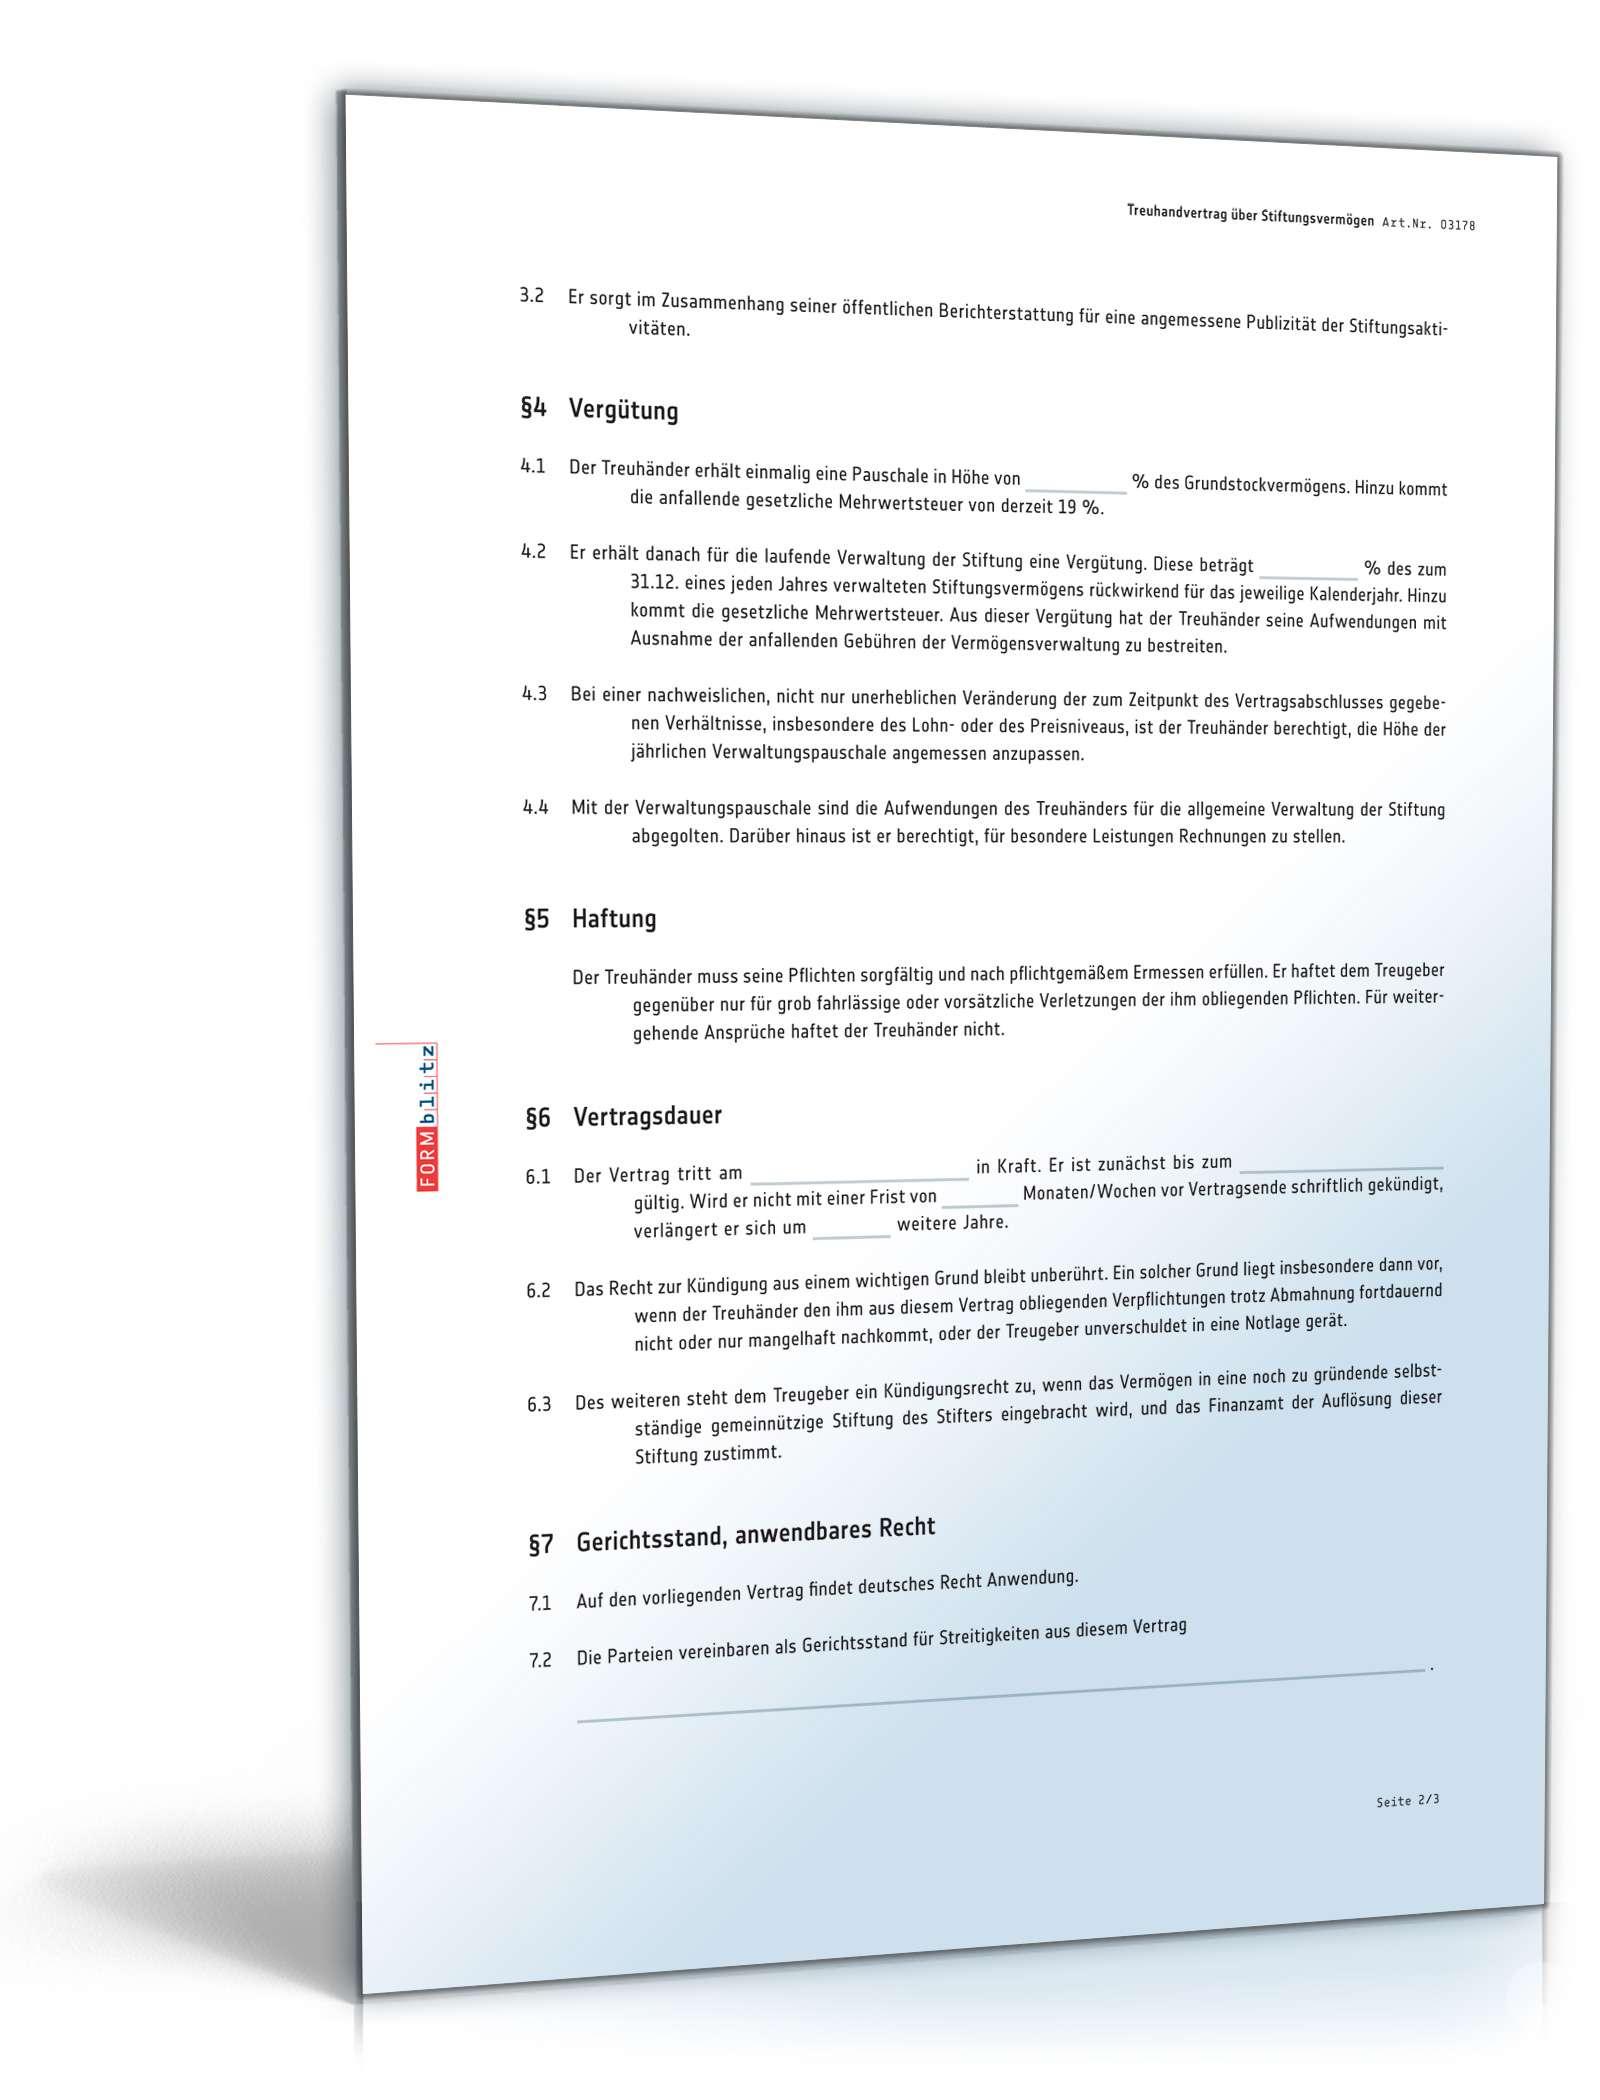 pdf seite 2 - Treuhandvertrag Muster